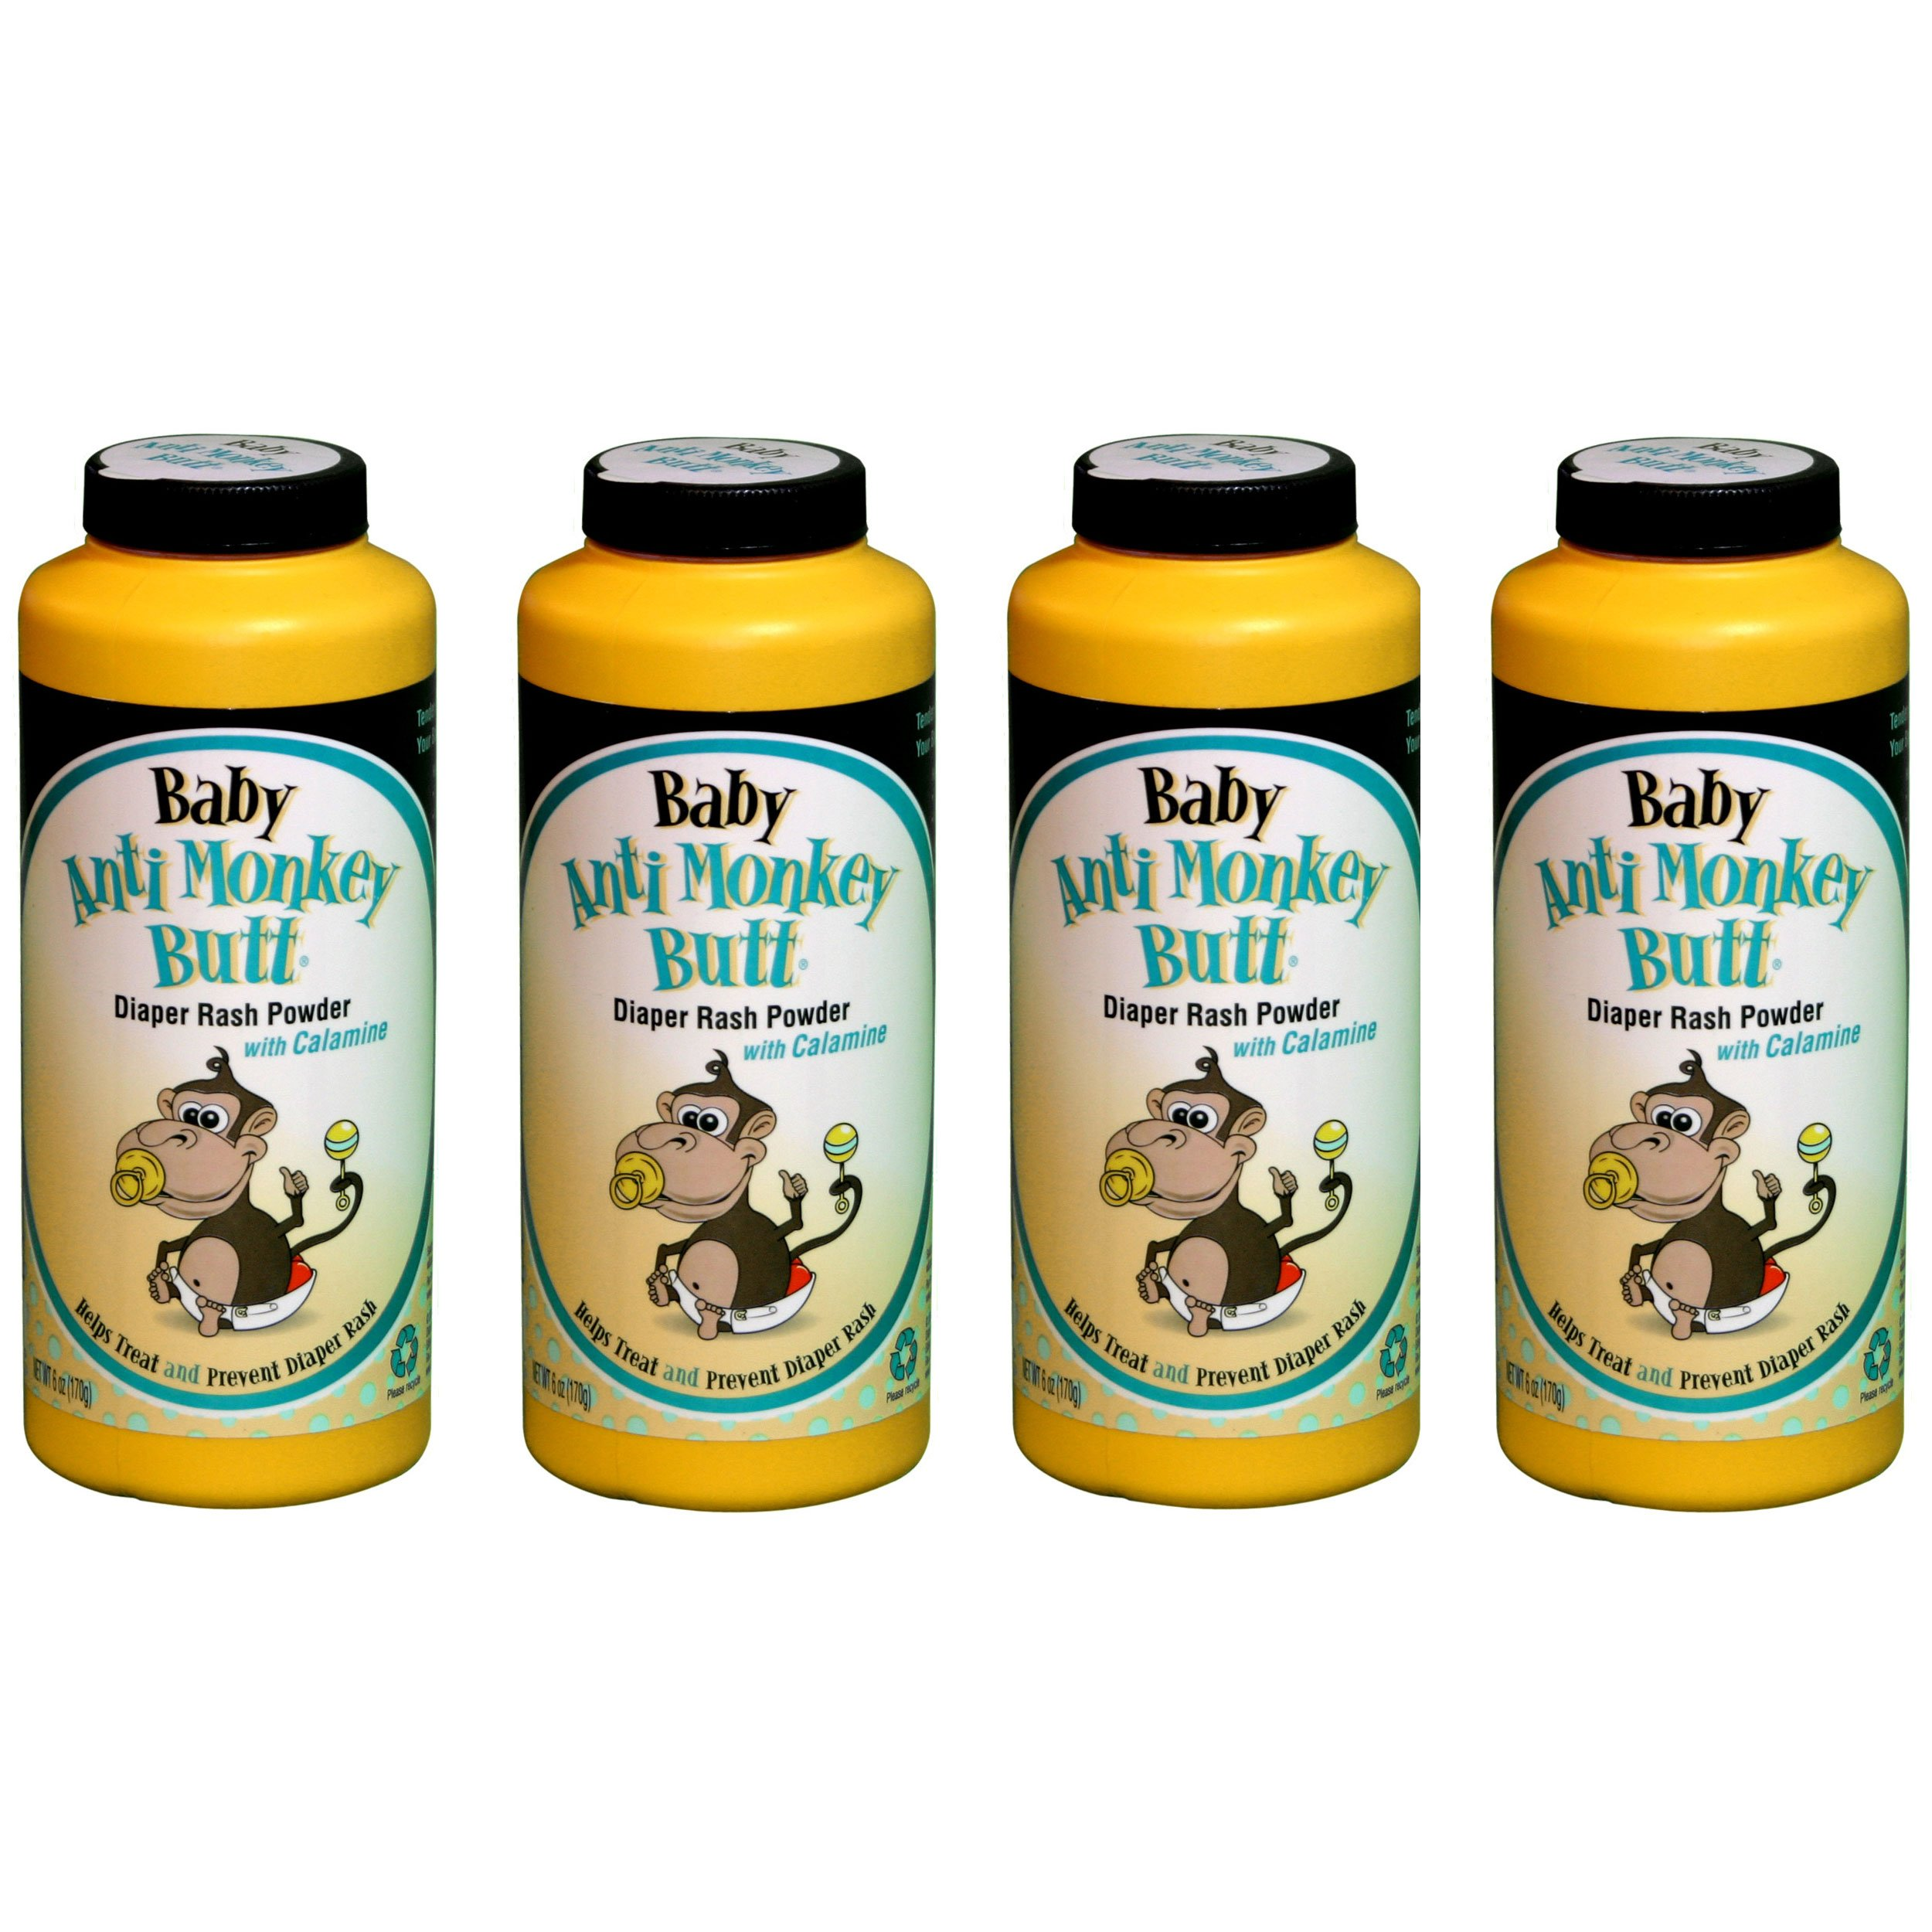 Anti Monkey Baby Butt Diaper Rash Powder with Calamine 6 oz (4 Pack) by Anti Monkey Butt